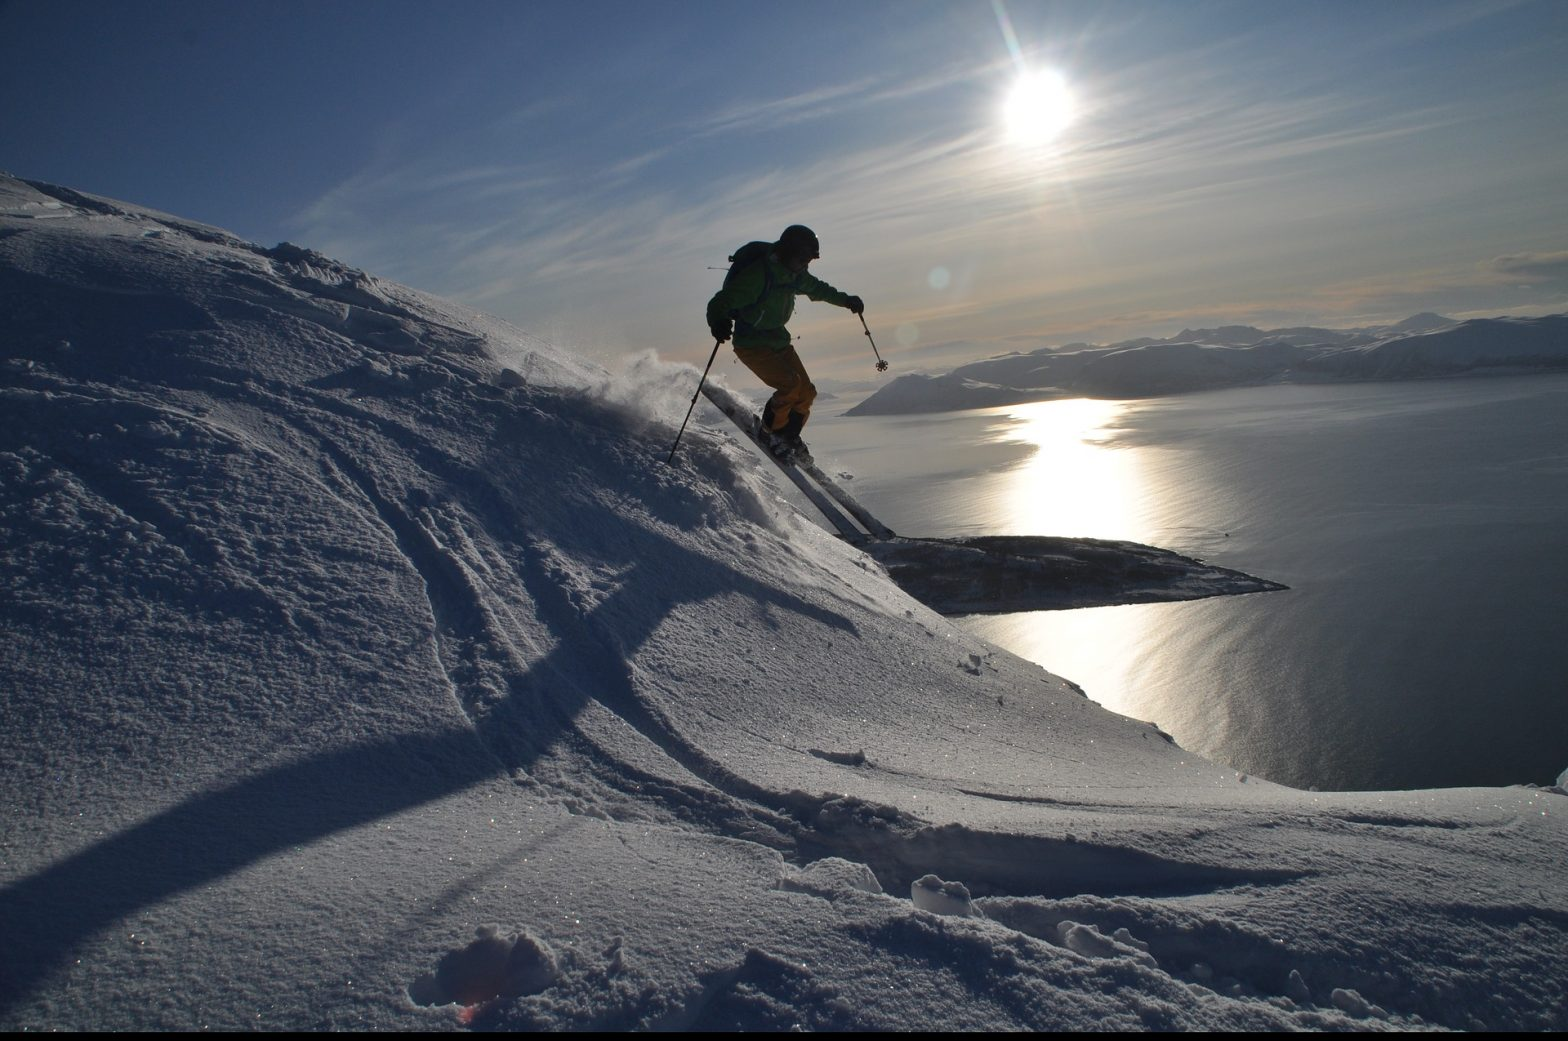 https://pixabay.com/de/ski-skitour-alpin-norwegen-lyngen-2341562/